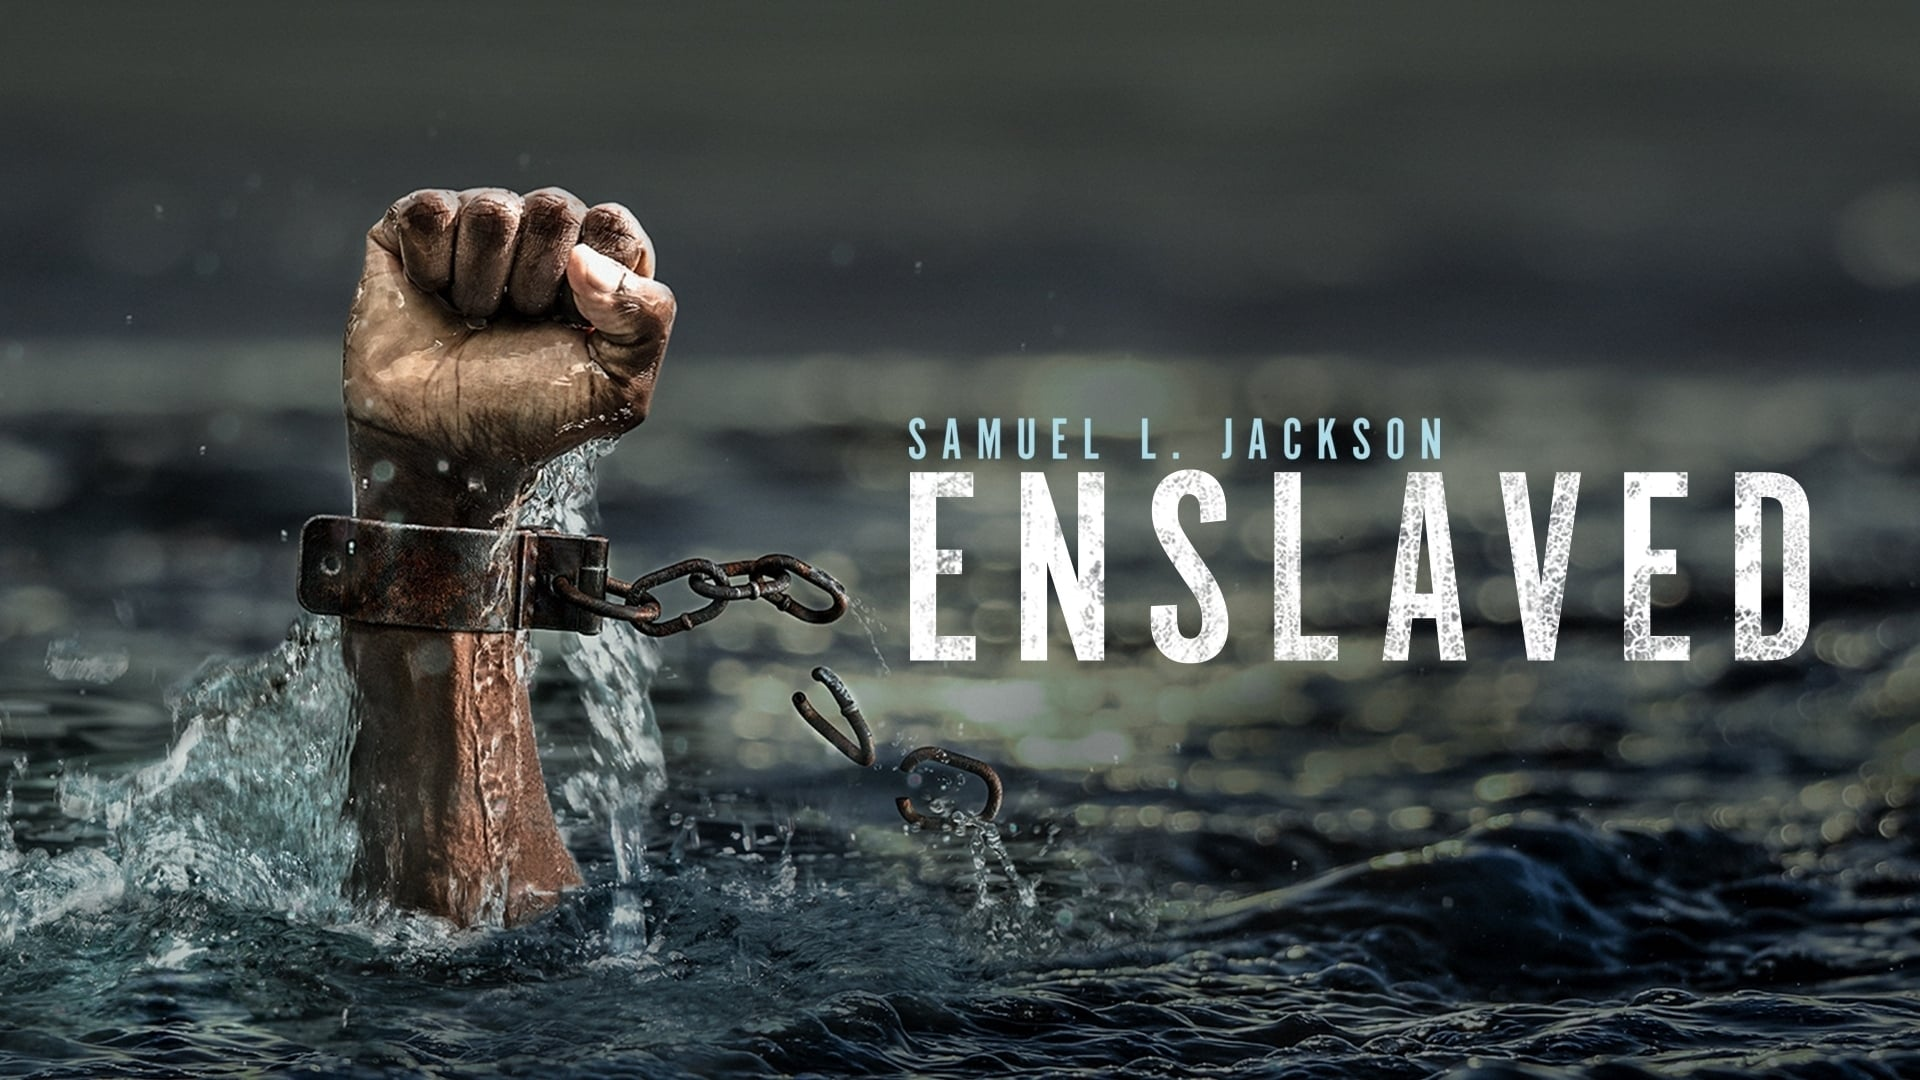 Maak kans op de miniserie Enslaved